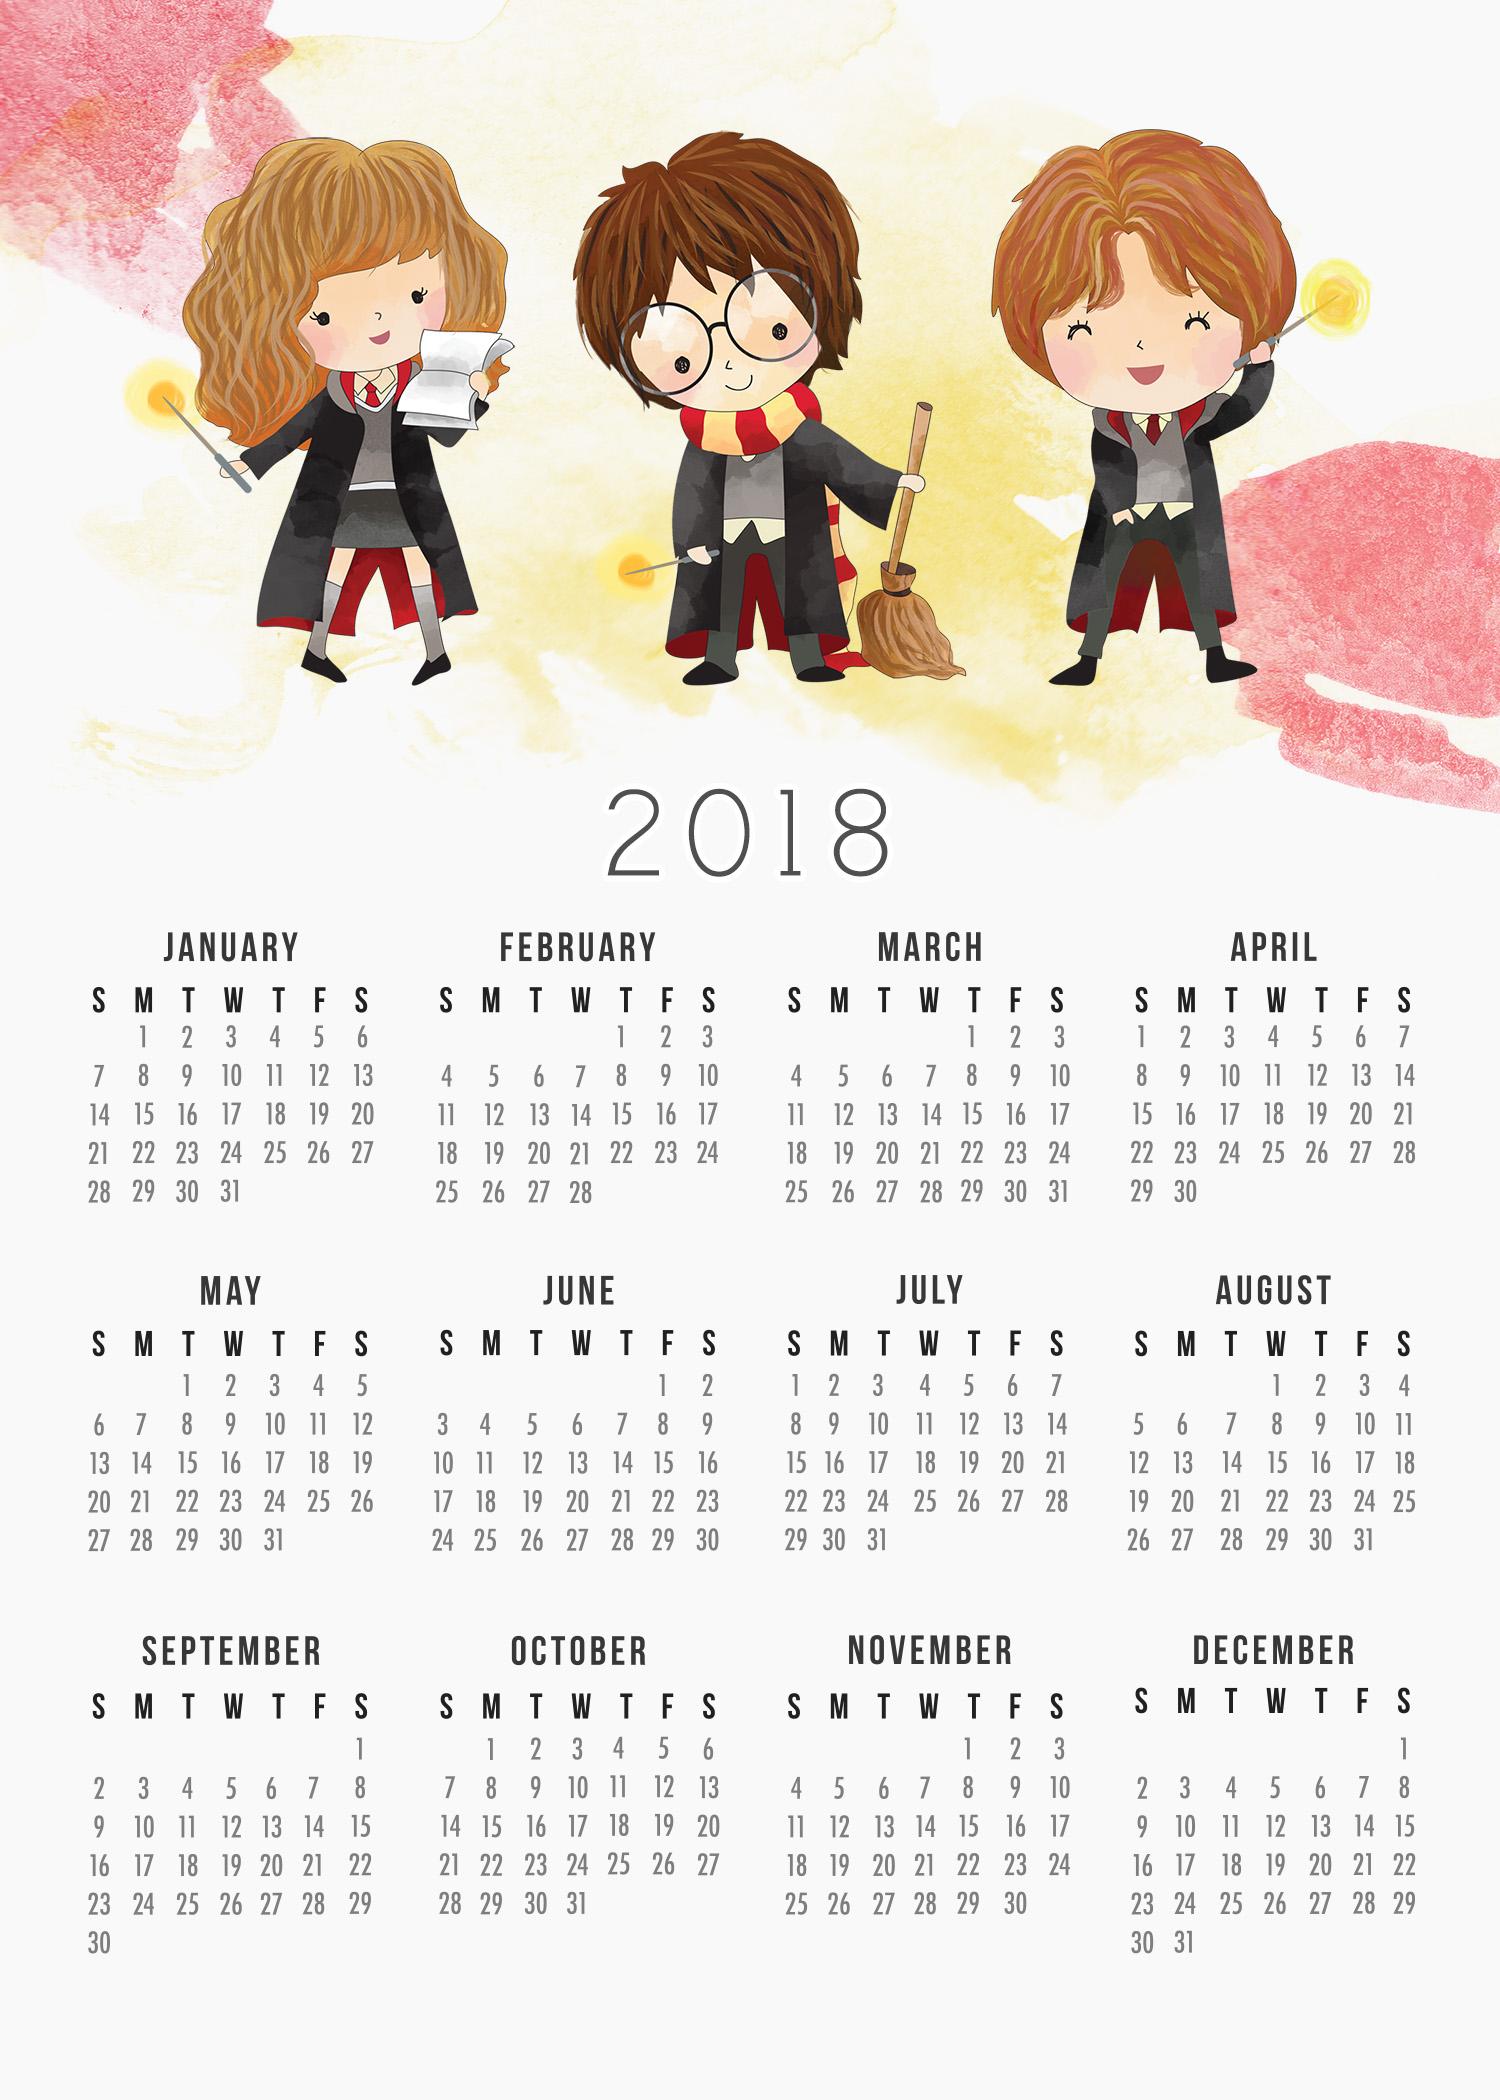 Free Printable 2018 Harry Potter Calendar - The Cottage Market